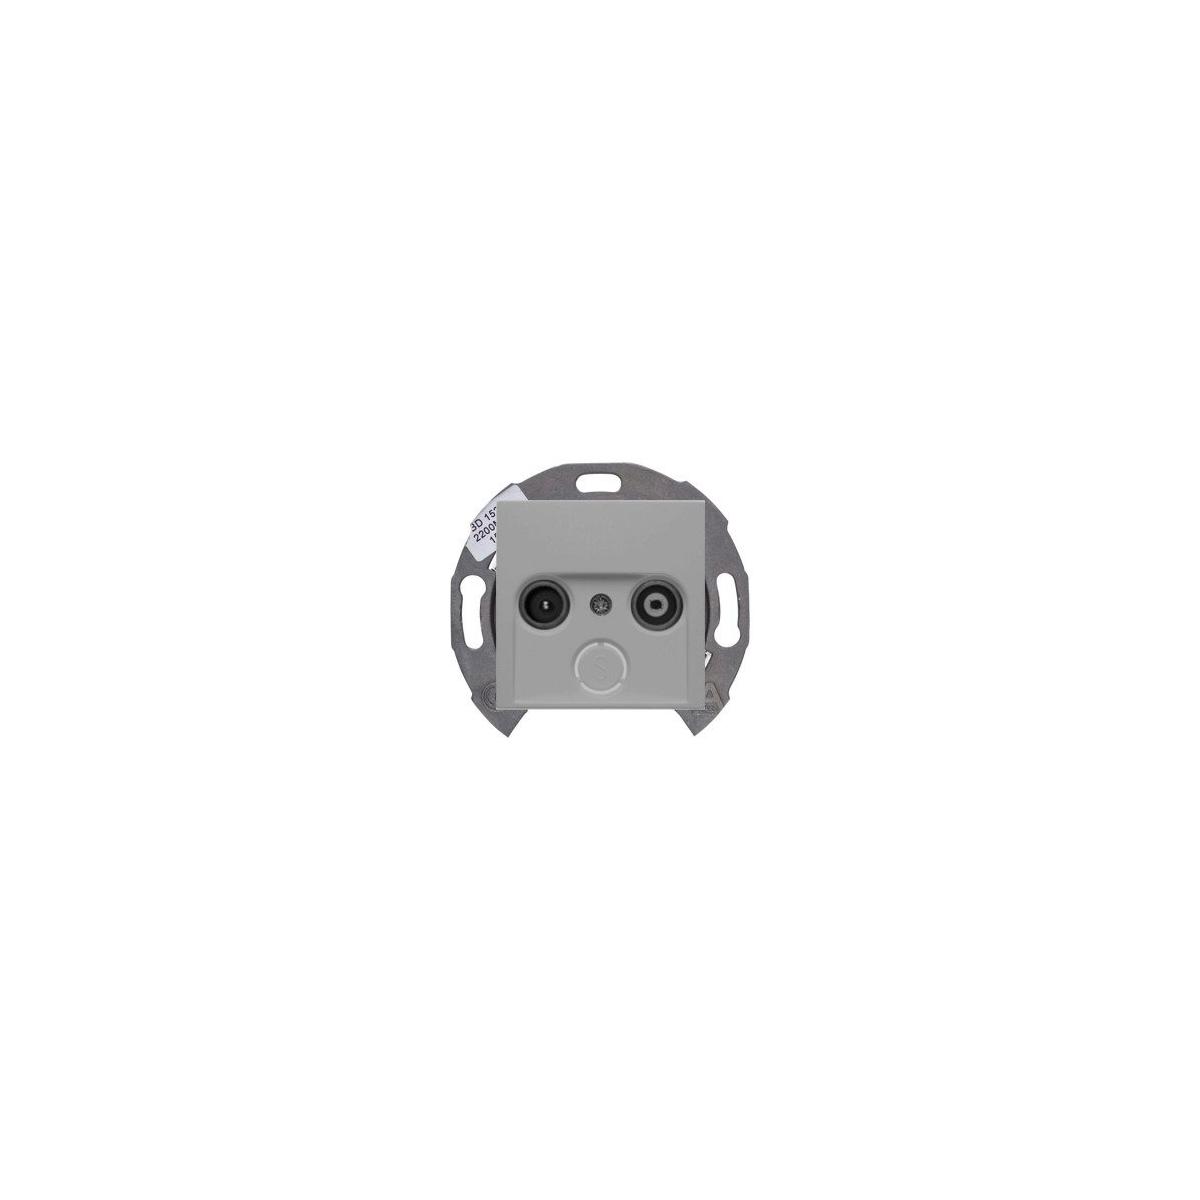 Gniazdo RTV przelotowe Berker B.1/B.3/B.7 aluminium mat (1x53455201+1x12031404)